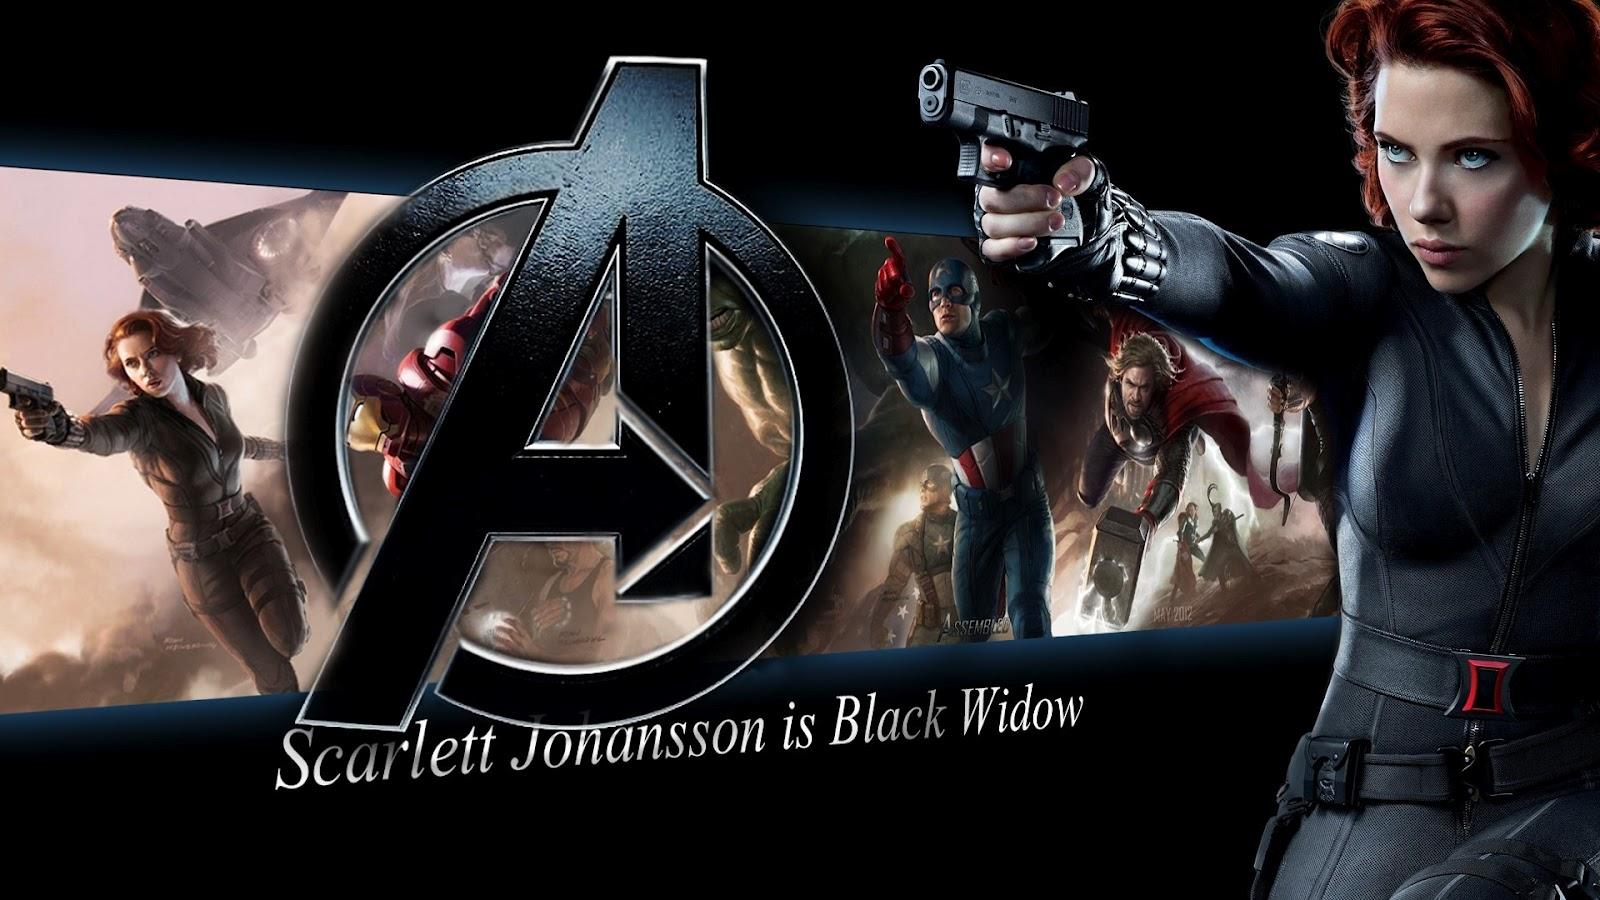 http://1.bp.blogspot.com/-1wvfR-cezaA/UCdj1Pvkp4I/AAAAAAAAC0k/6Lx4qTaShR0/s1600/avengers_scarlett_johansson_black_widow_movies_posters-1920x1080.jpg